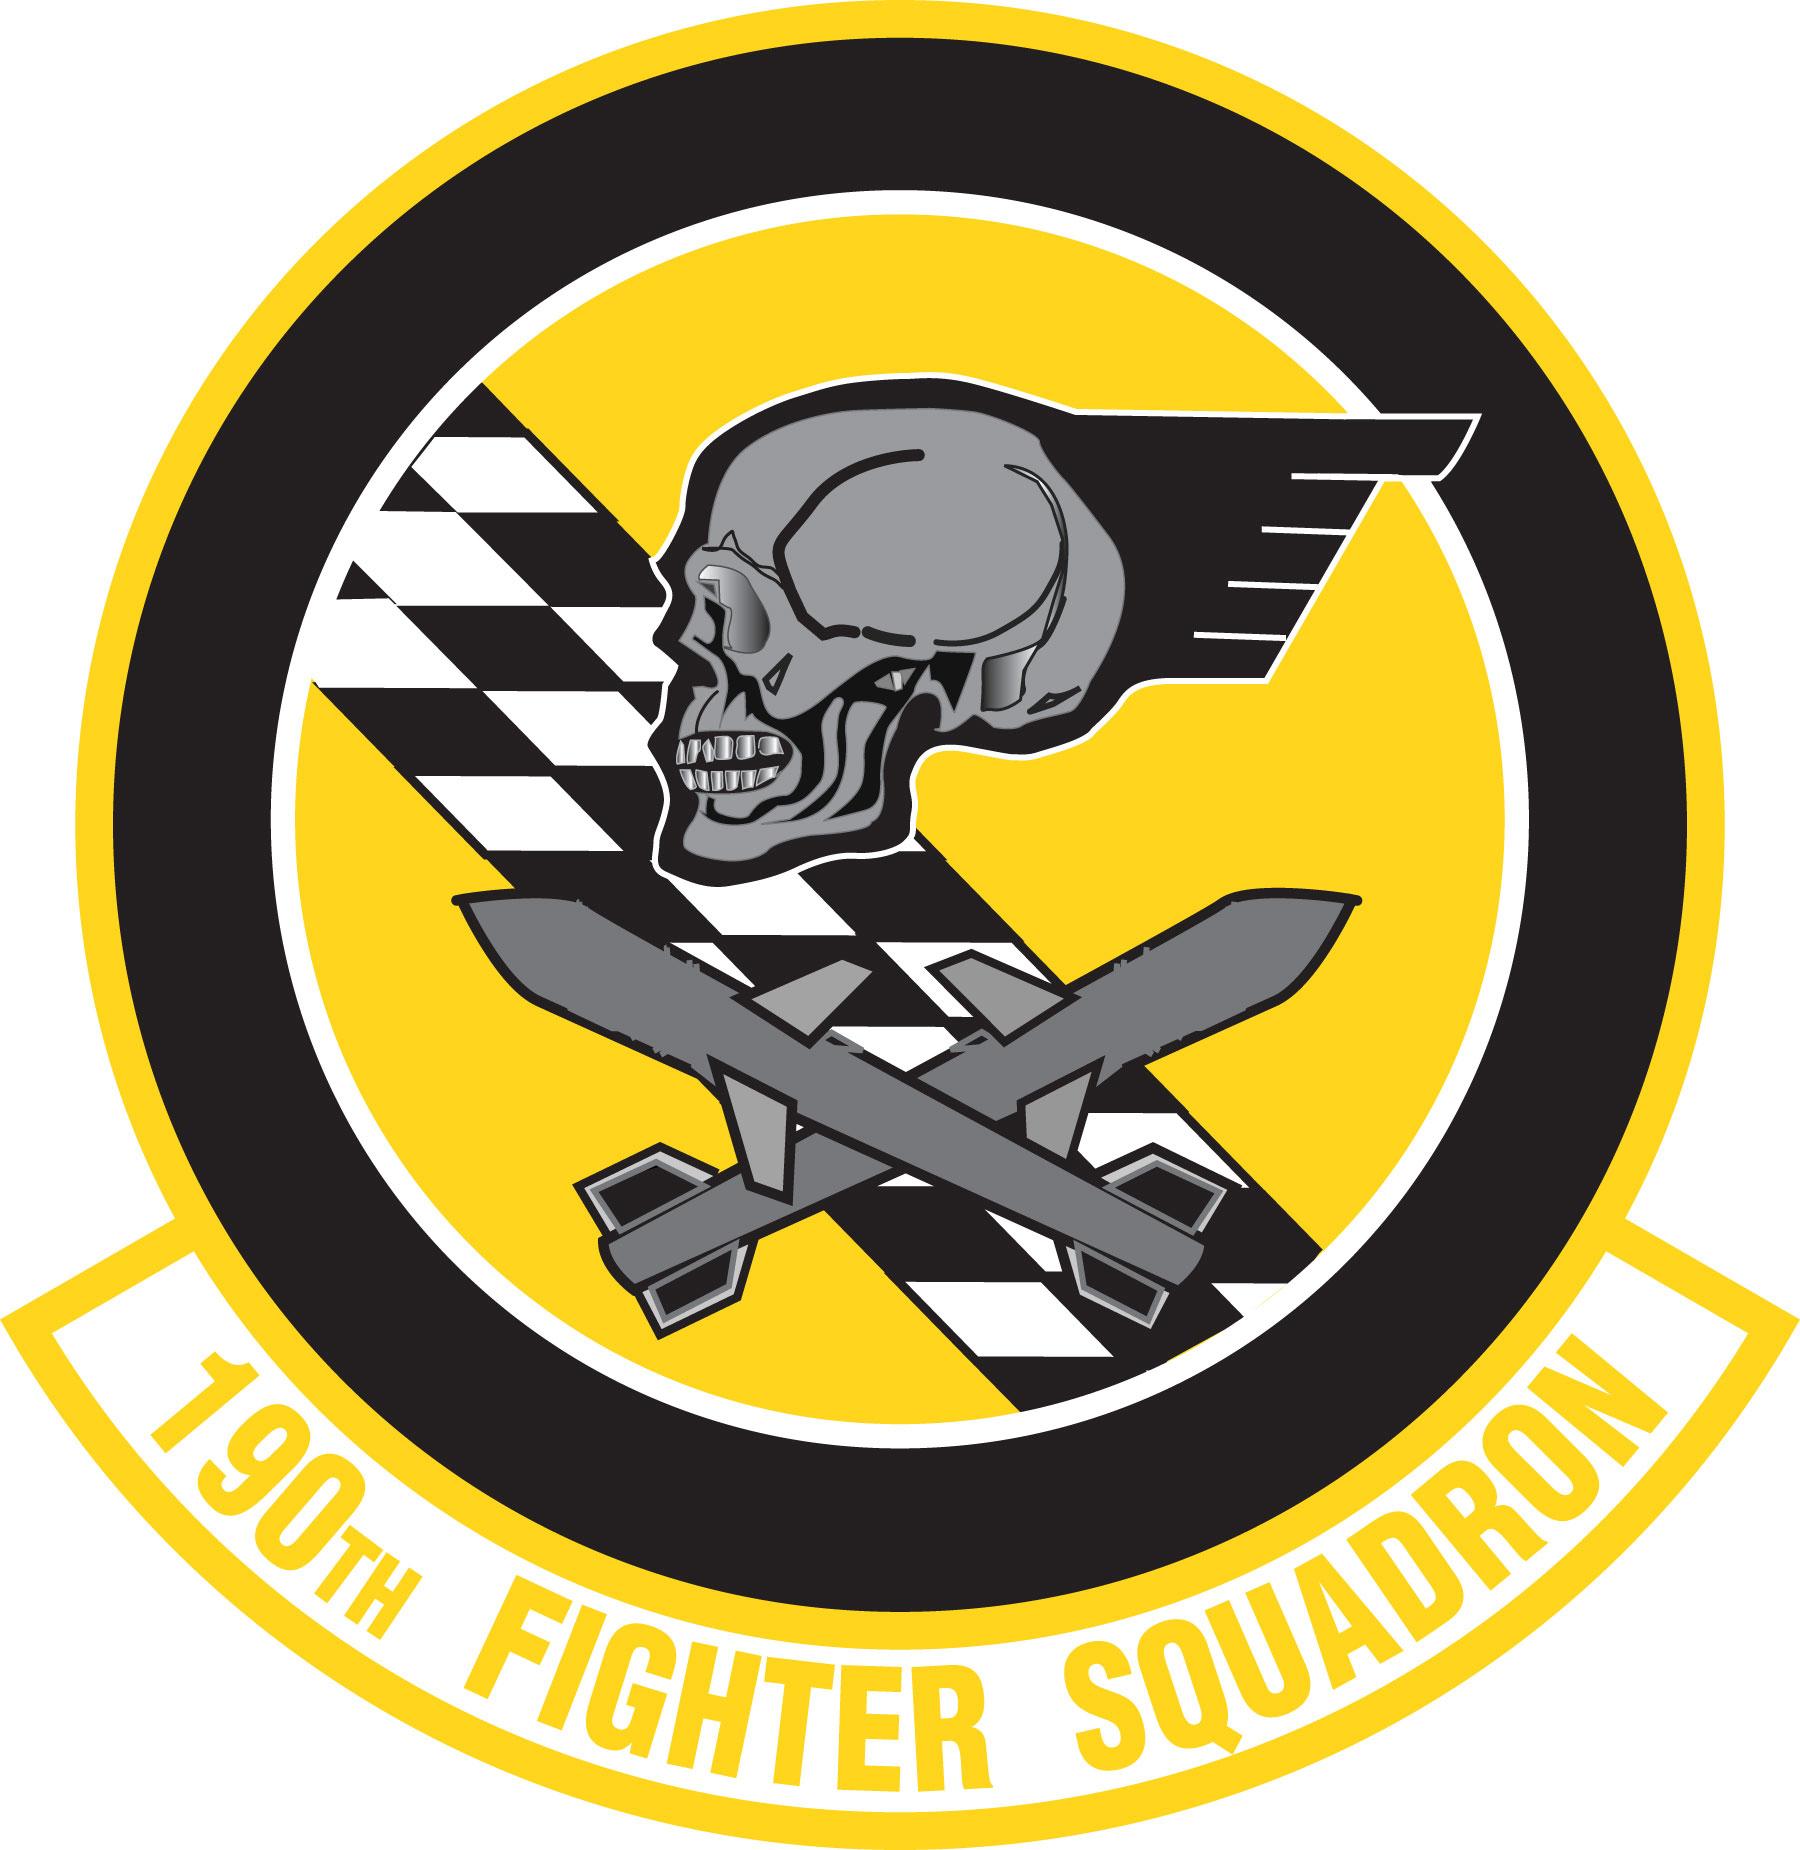 Fighter Squadron Logos 190th Fighter Squadron